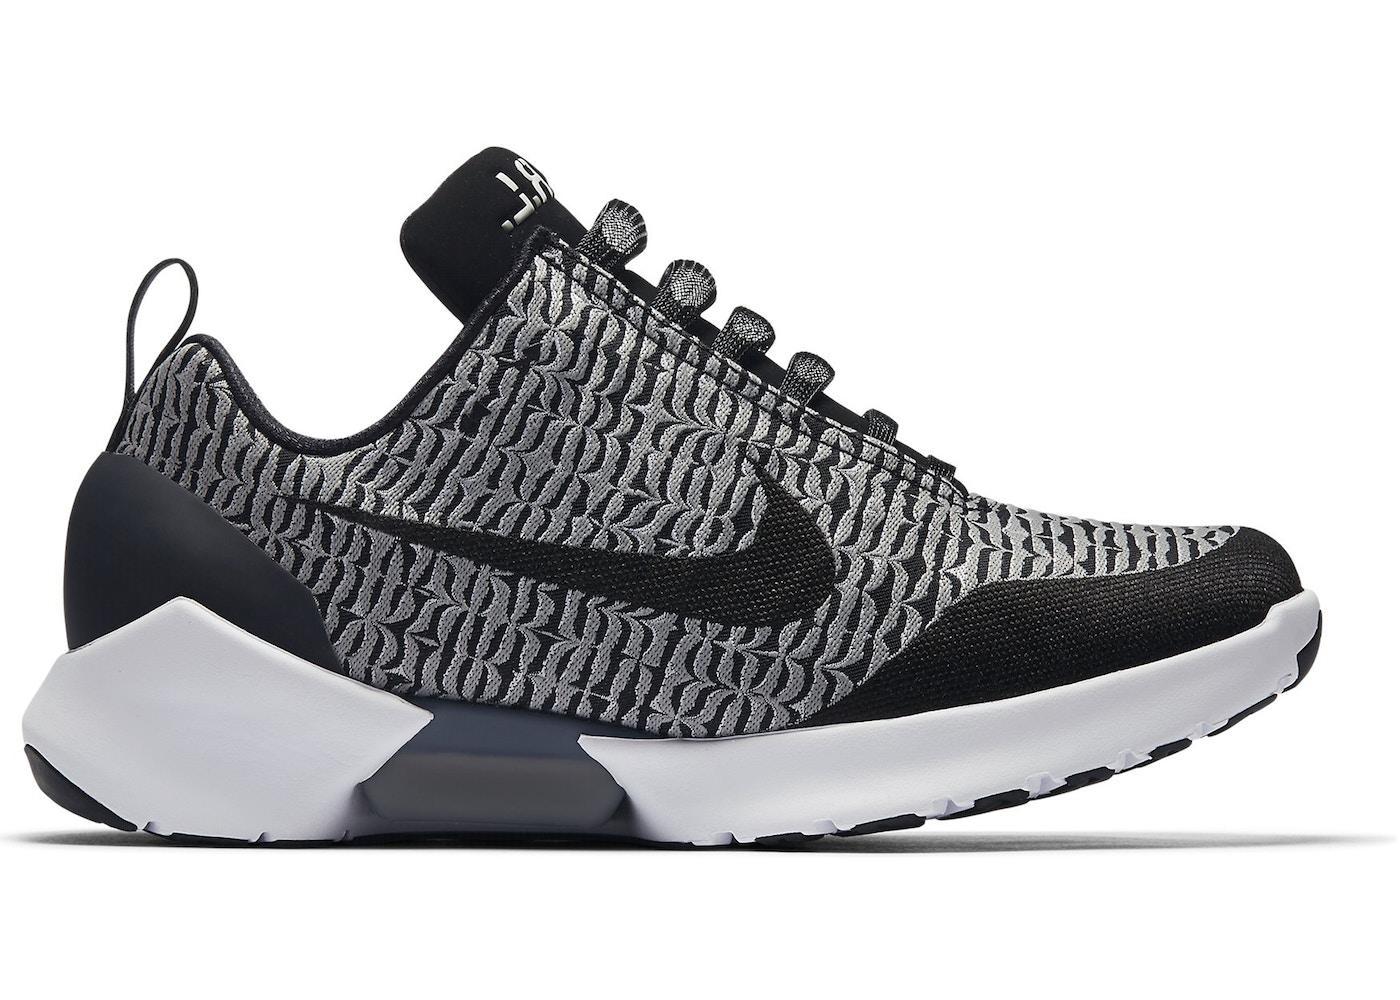 6c9d6f11 Nike HyperAdapt 1.0 Wolf Grey - 843871-010/AH9388-003 (EU)